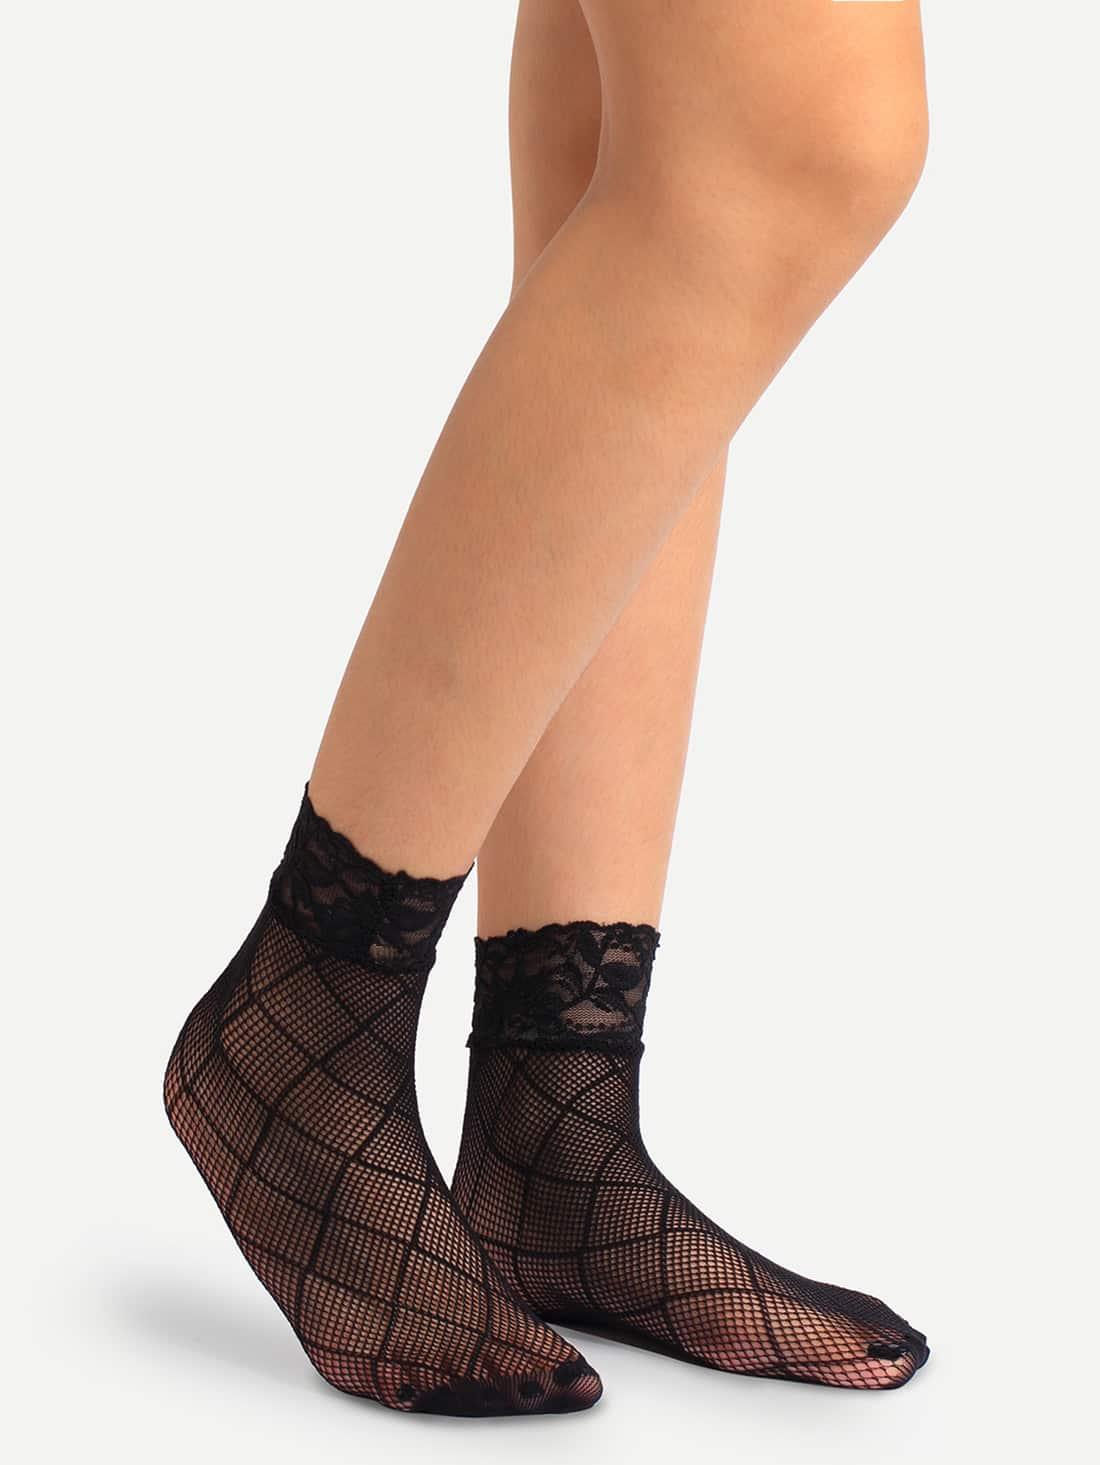 Black Crisscross Hollow Mesh Lace Ankle Socks sock160706302